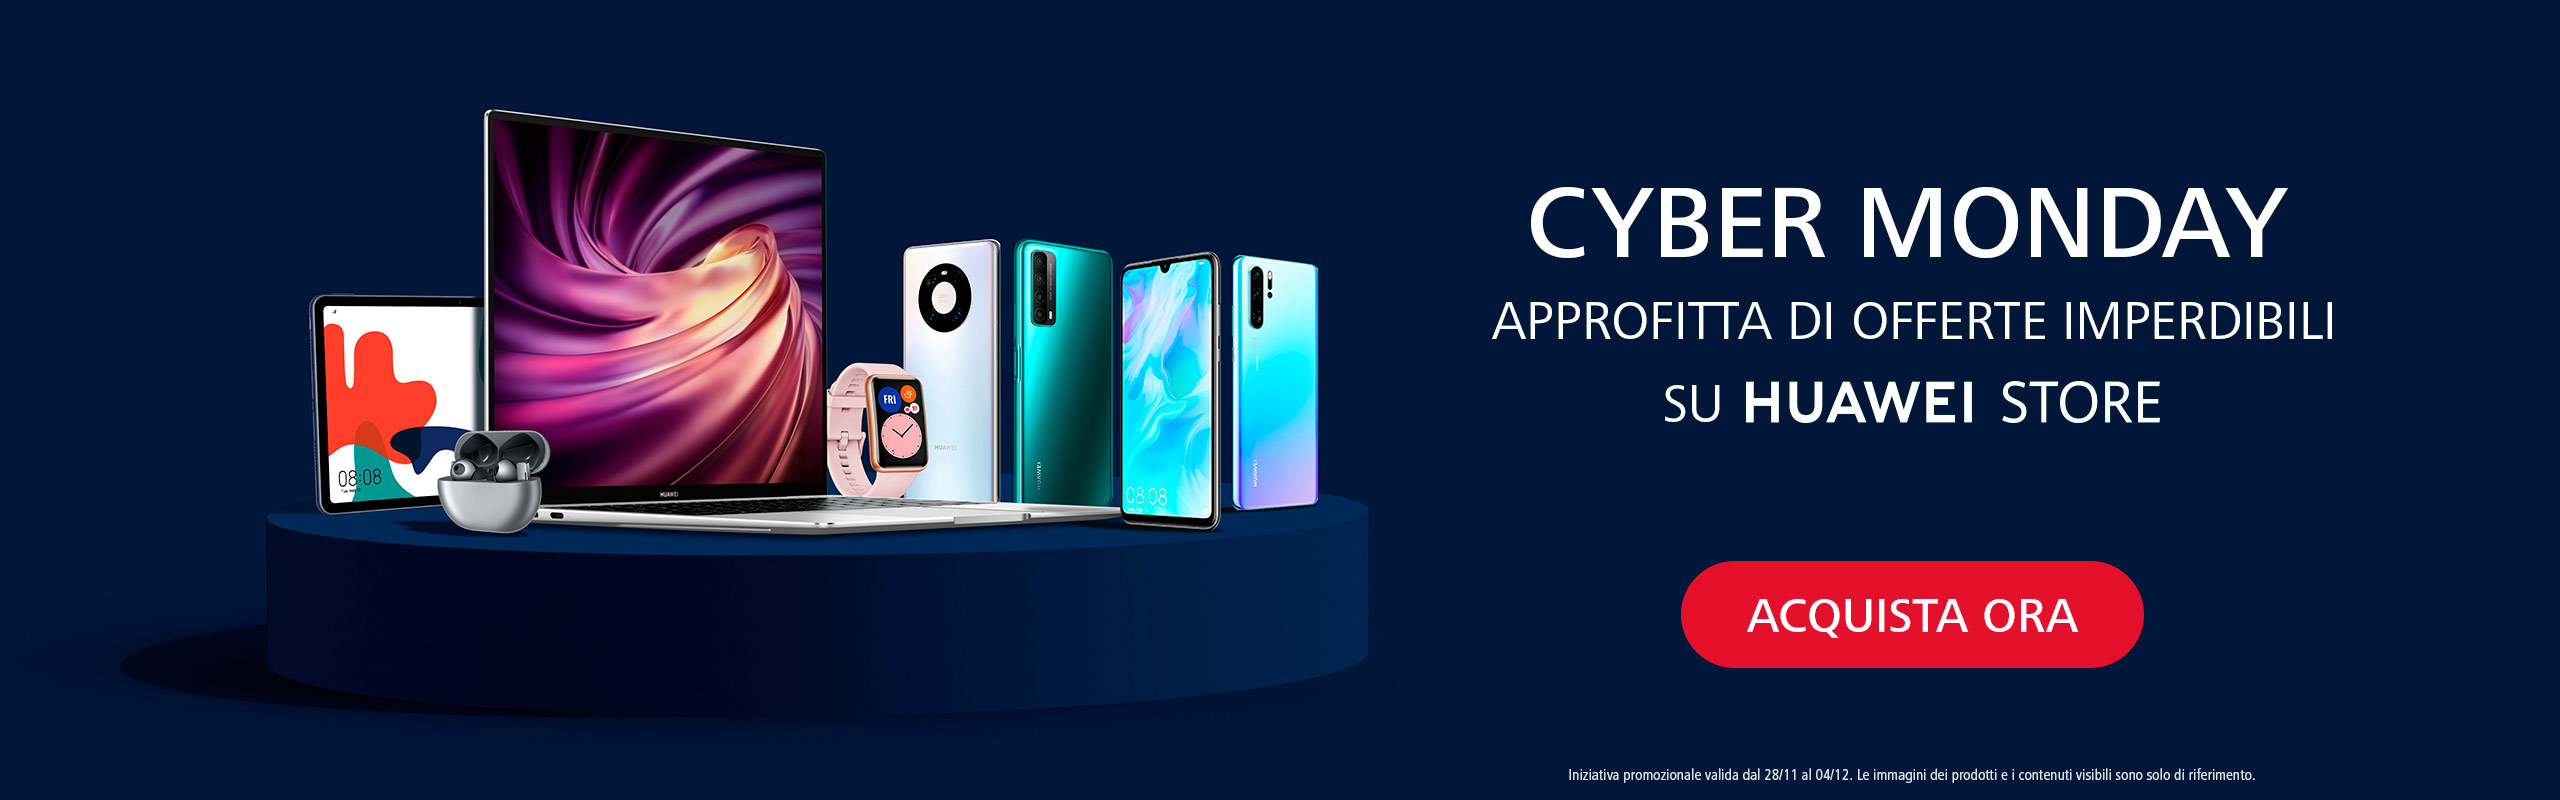 Offerte di Huawei per il Cyber Monday 2020